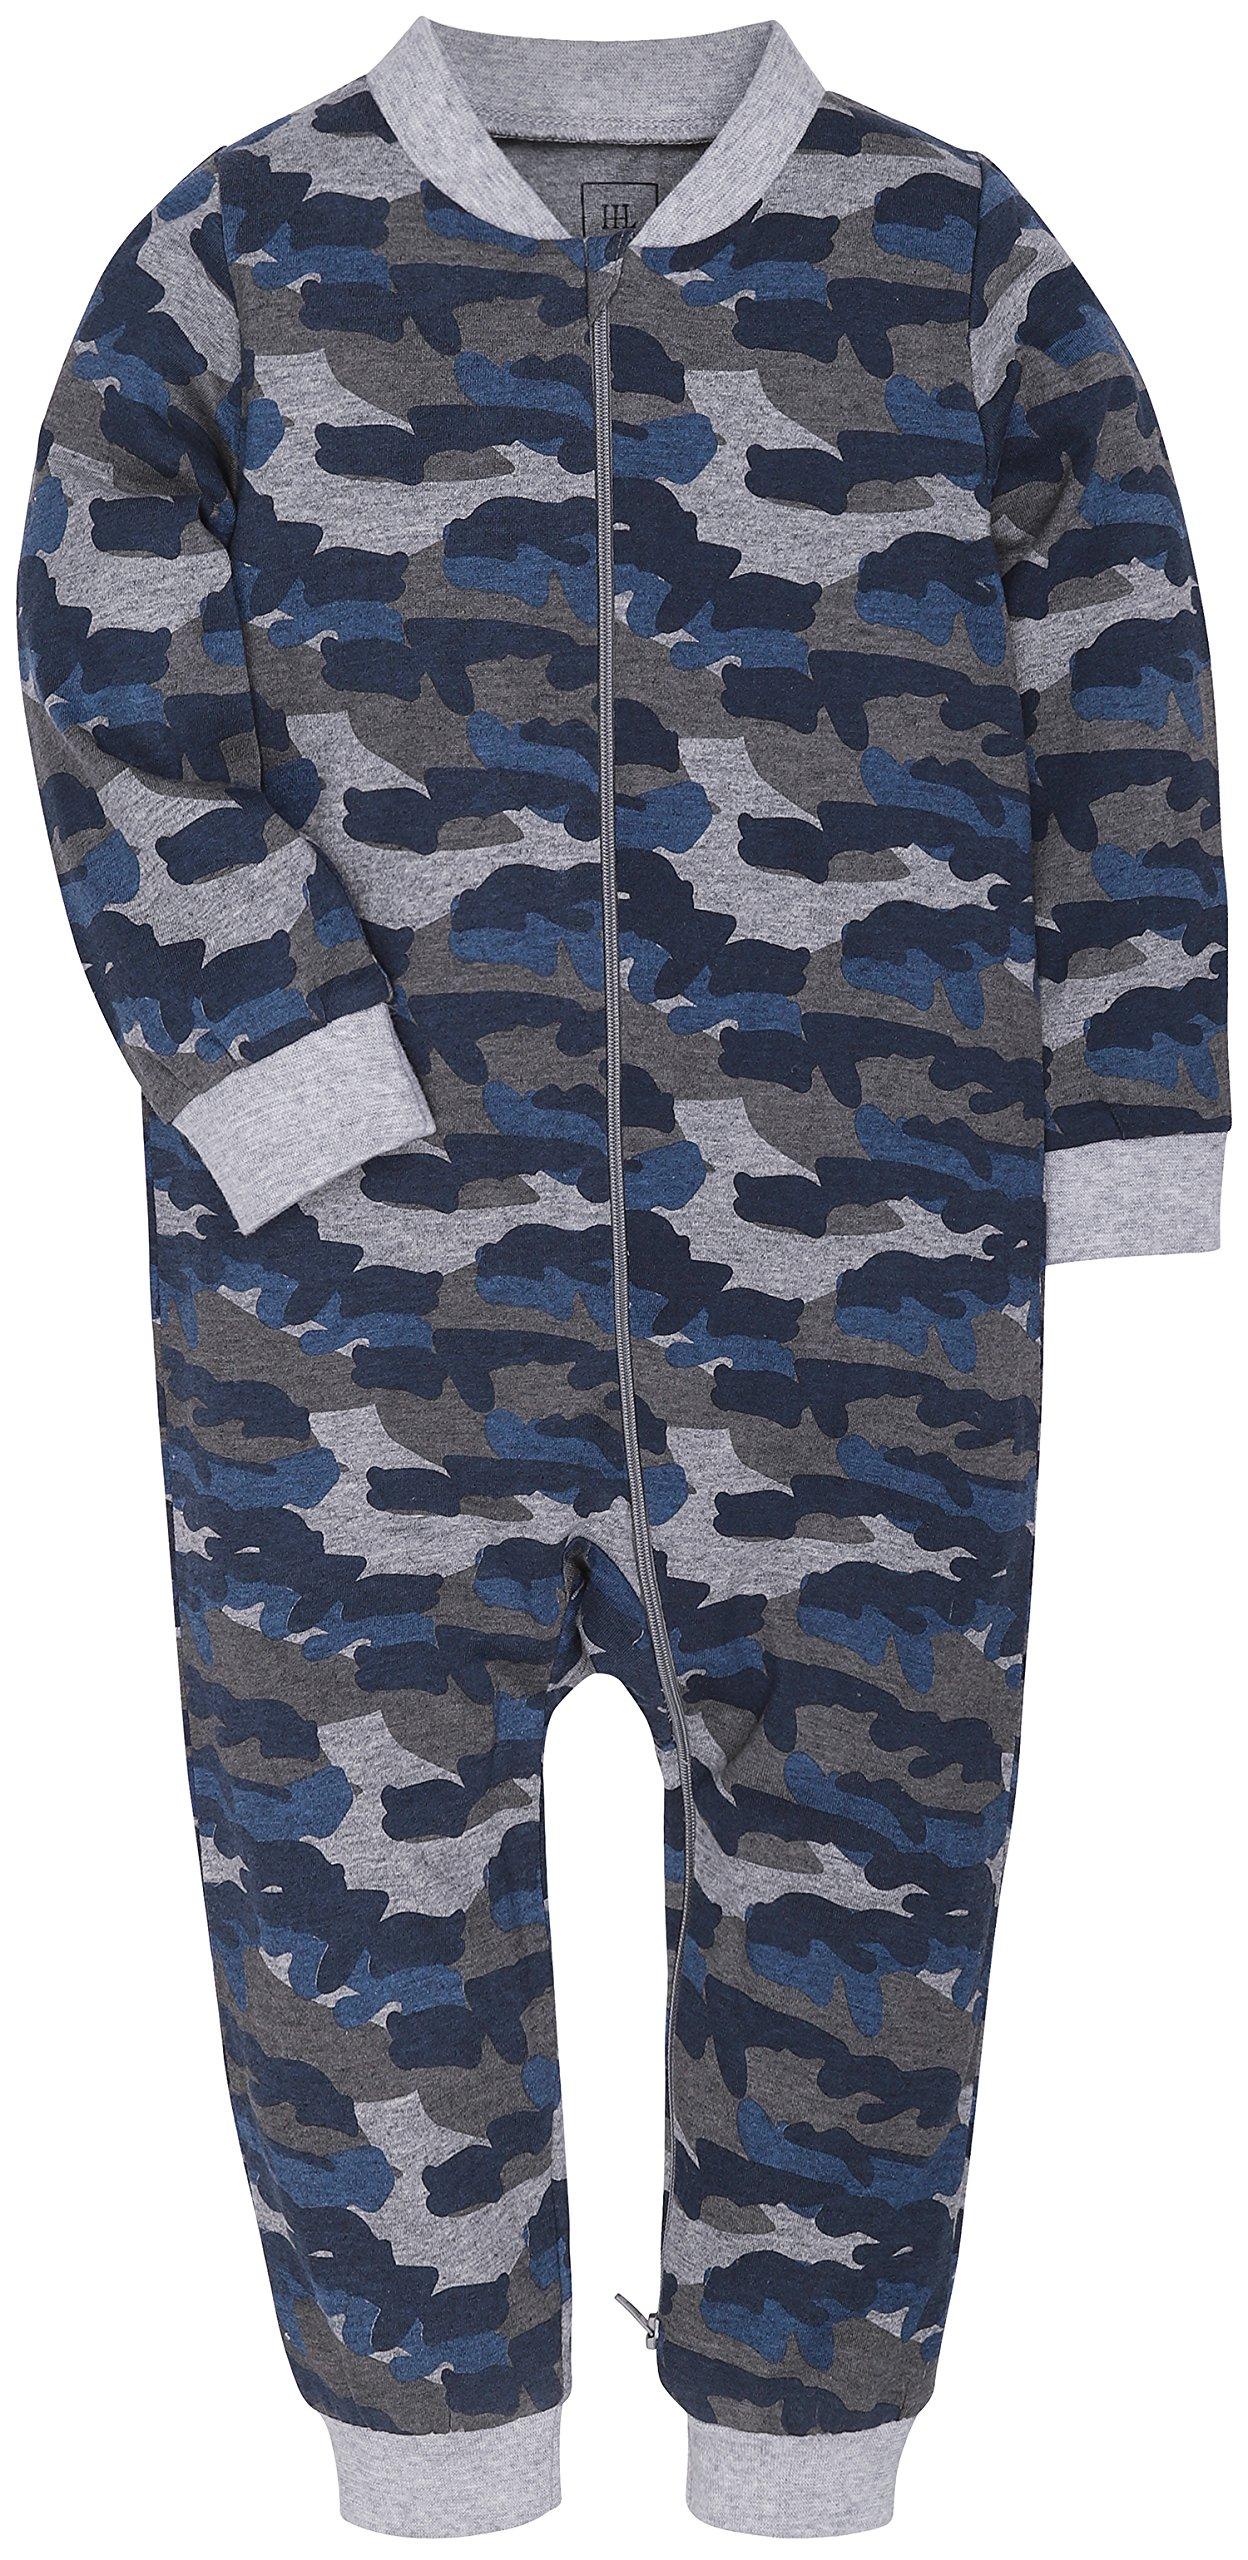 MZL 2-Pack Baby Infant Boy Girl Pajamas Romper Clothes Bodysuit Newborn Jumpsuit by MZL (Image #2)